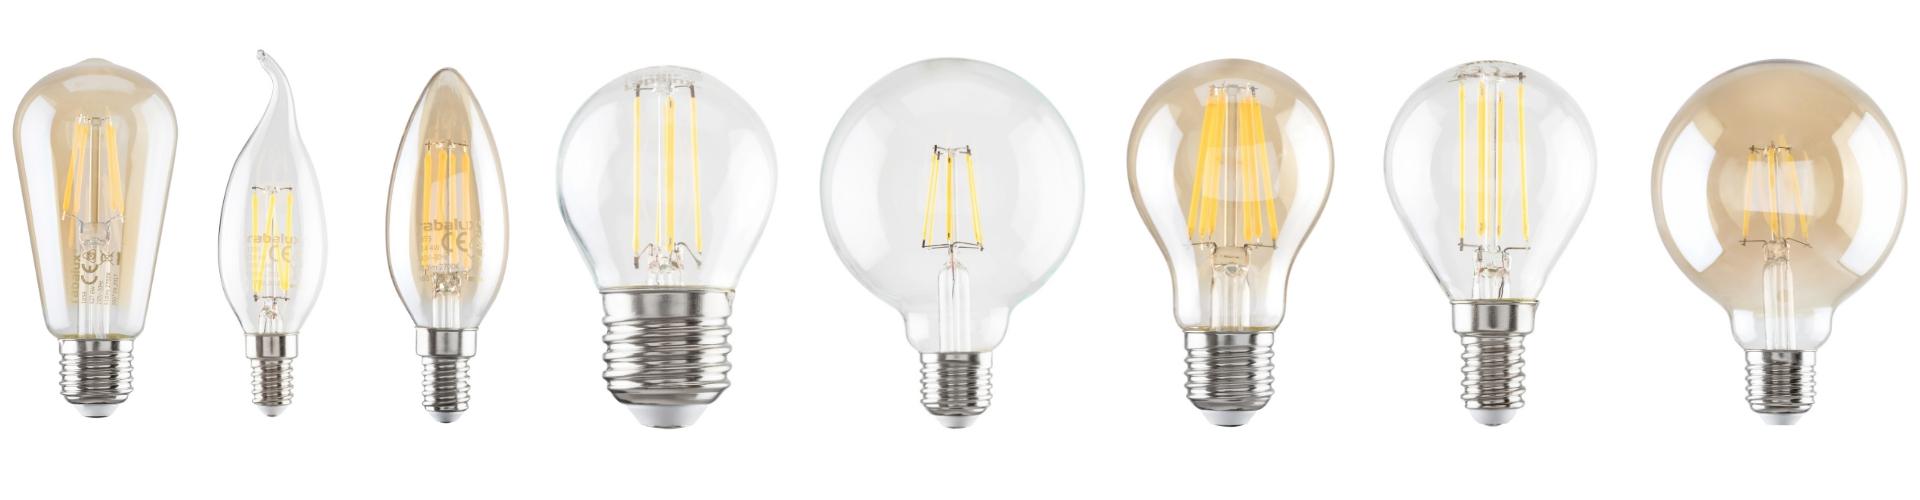 LED gijos